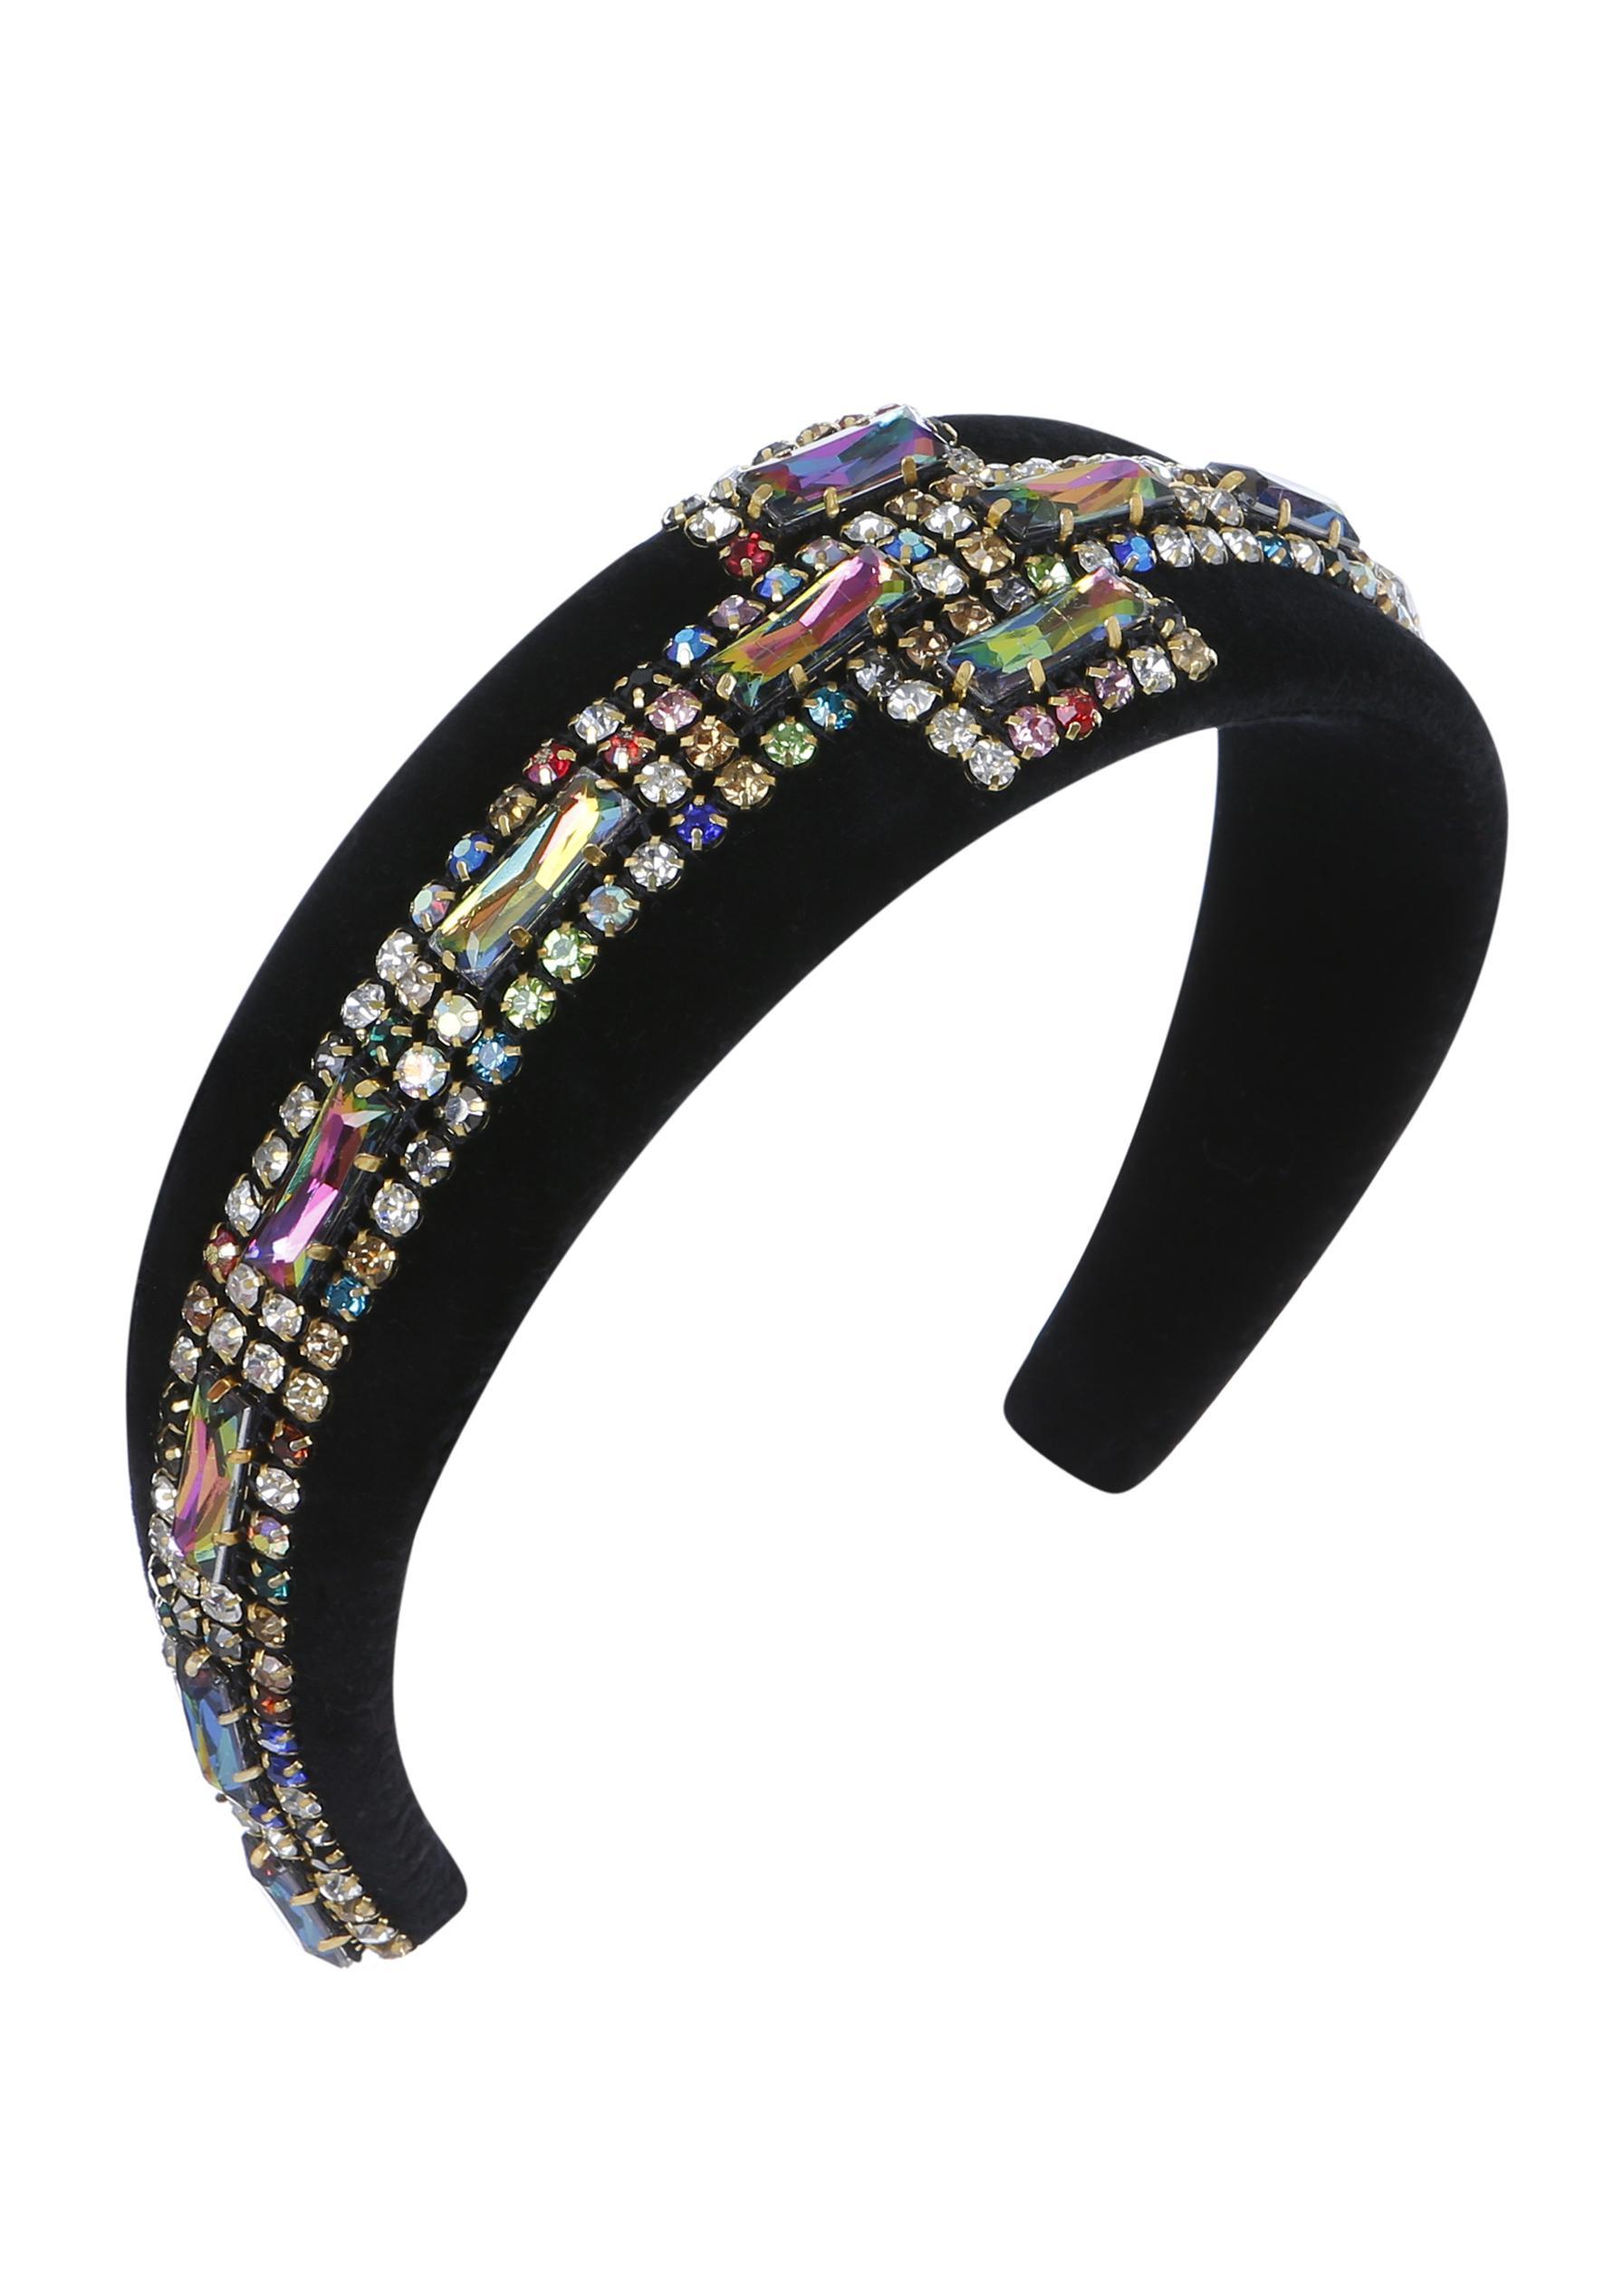 Terpsichore headband